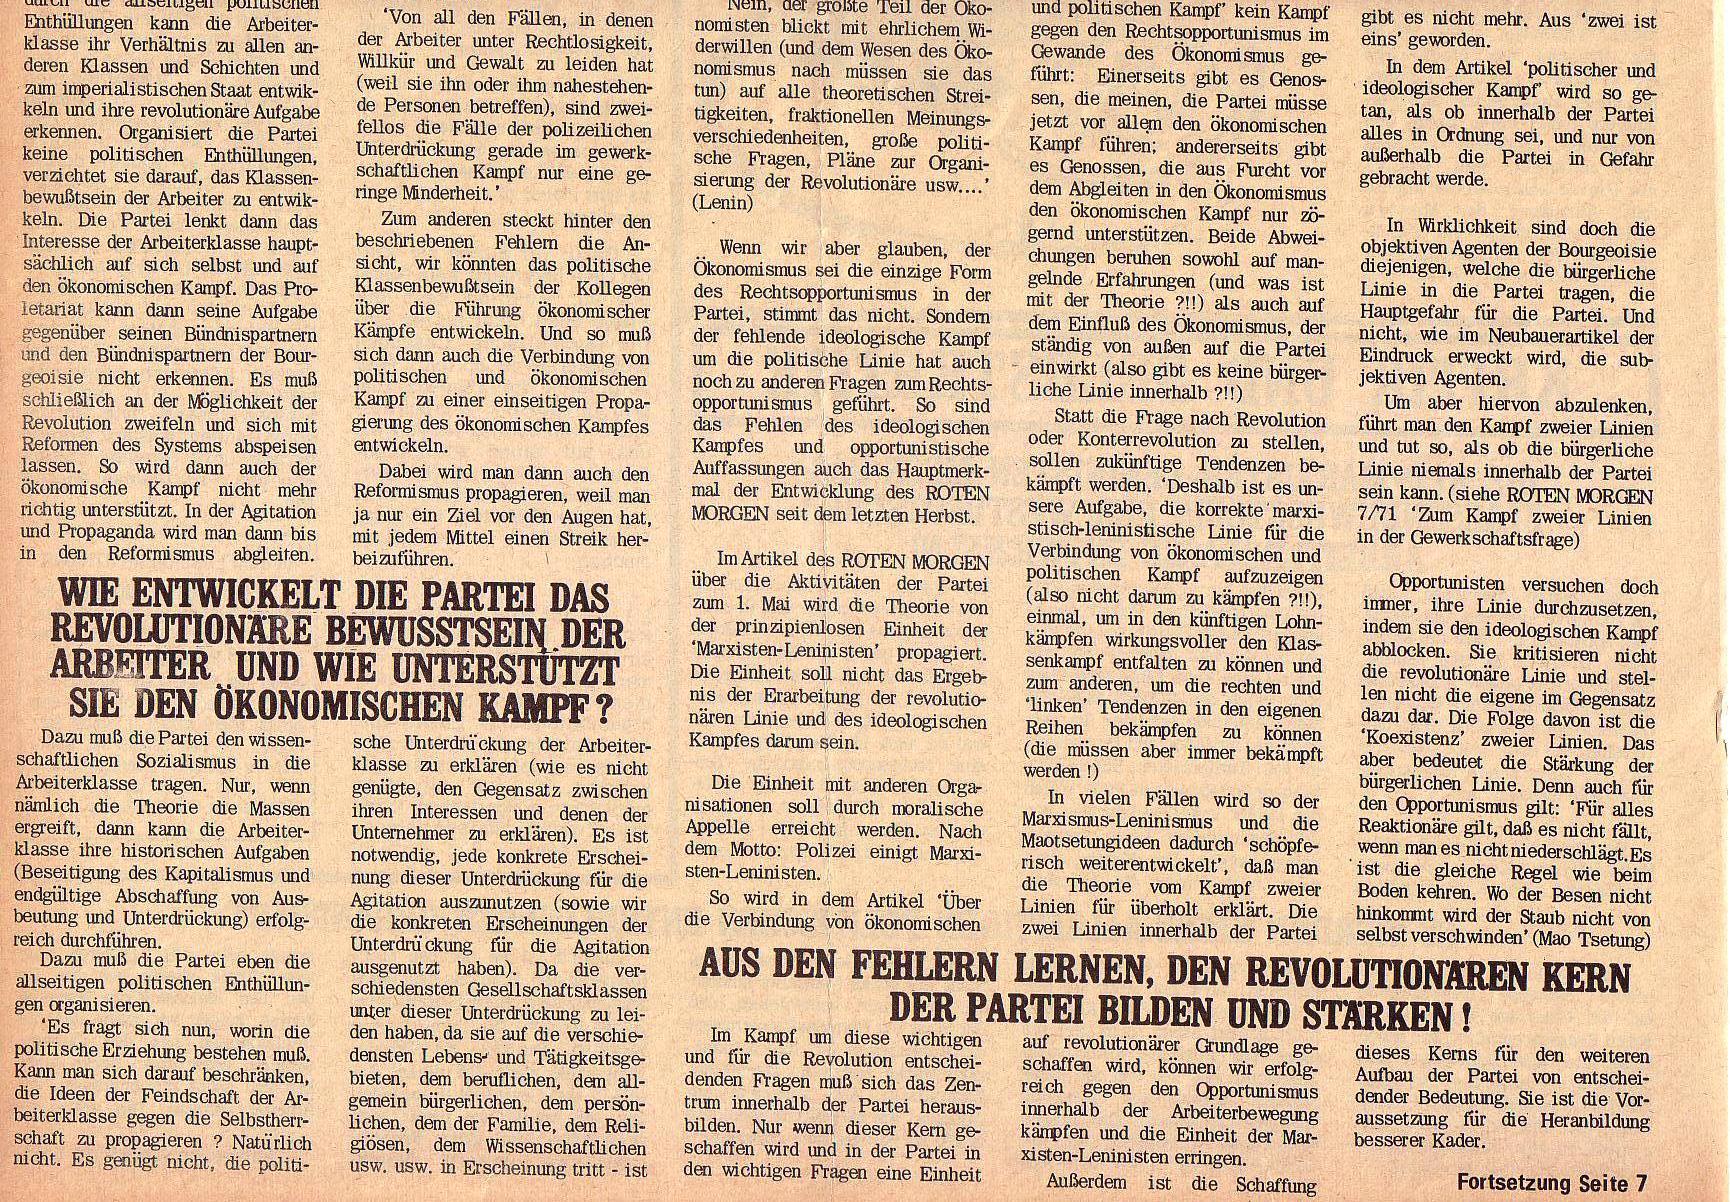 Roter Morgen, 5. Jg., 27. September 1971, Nr. 10, Seite 6b